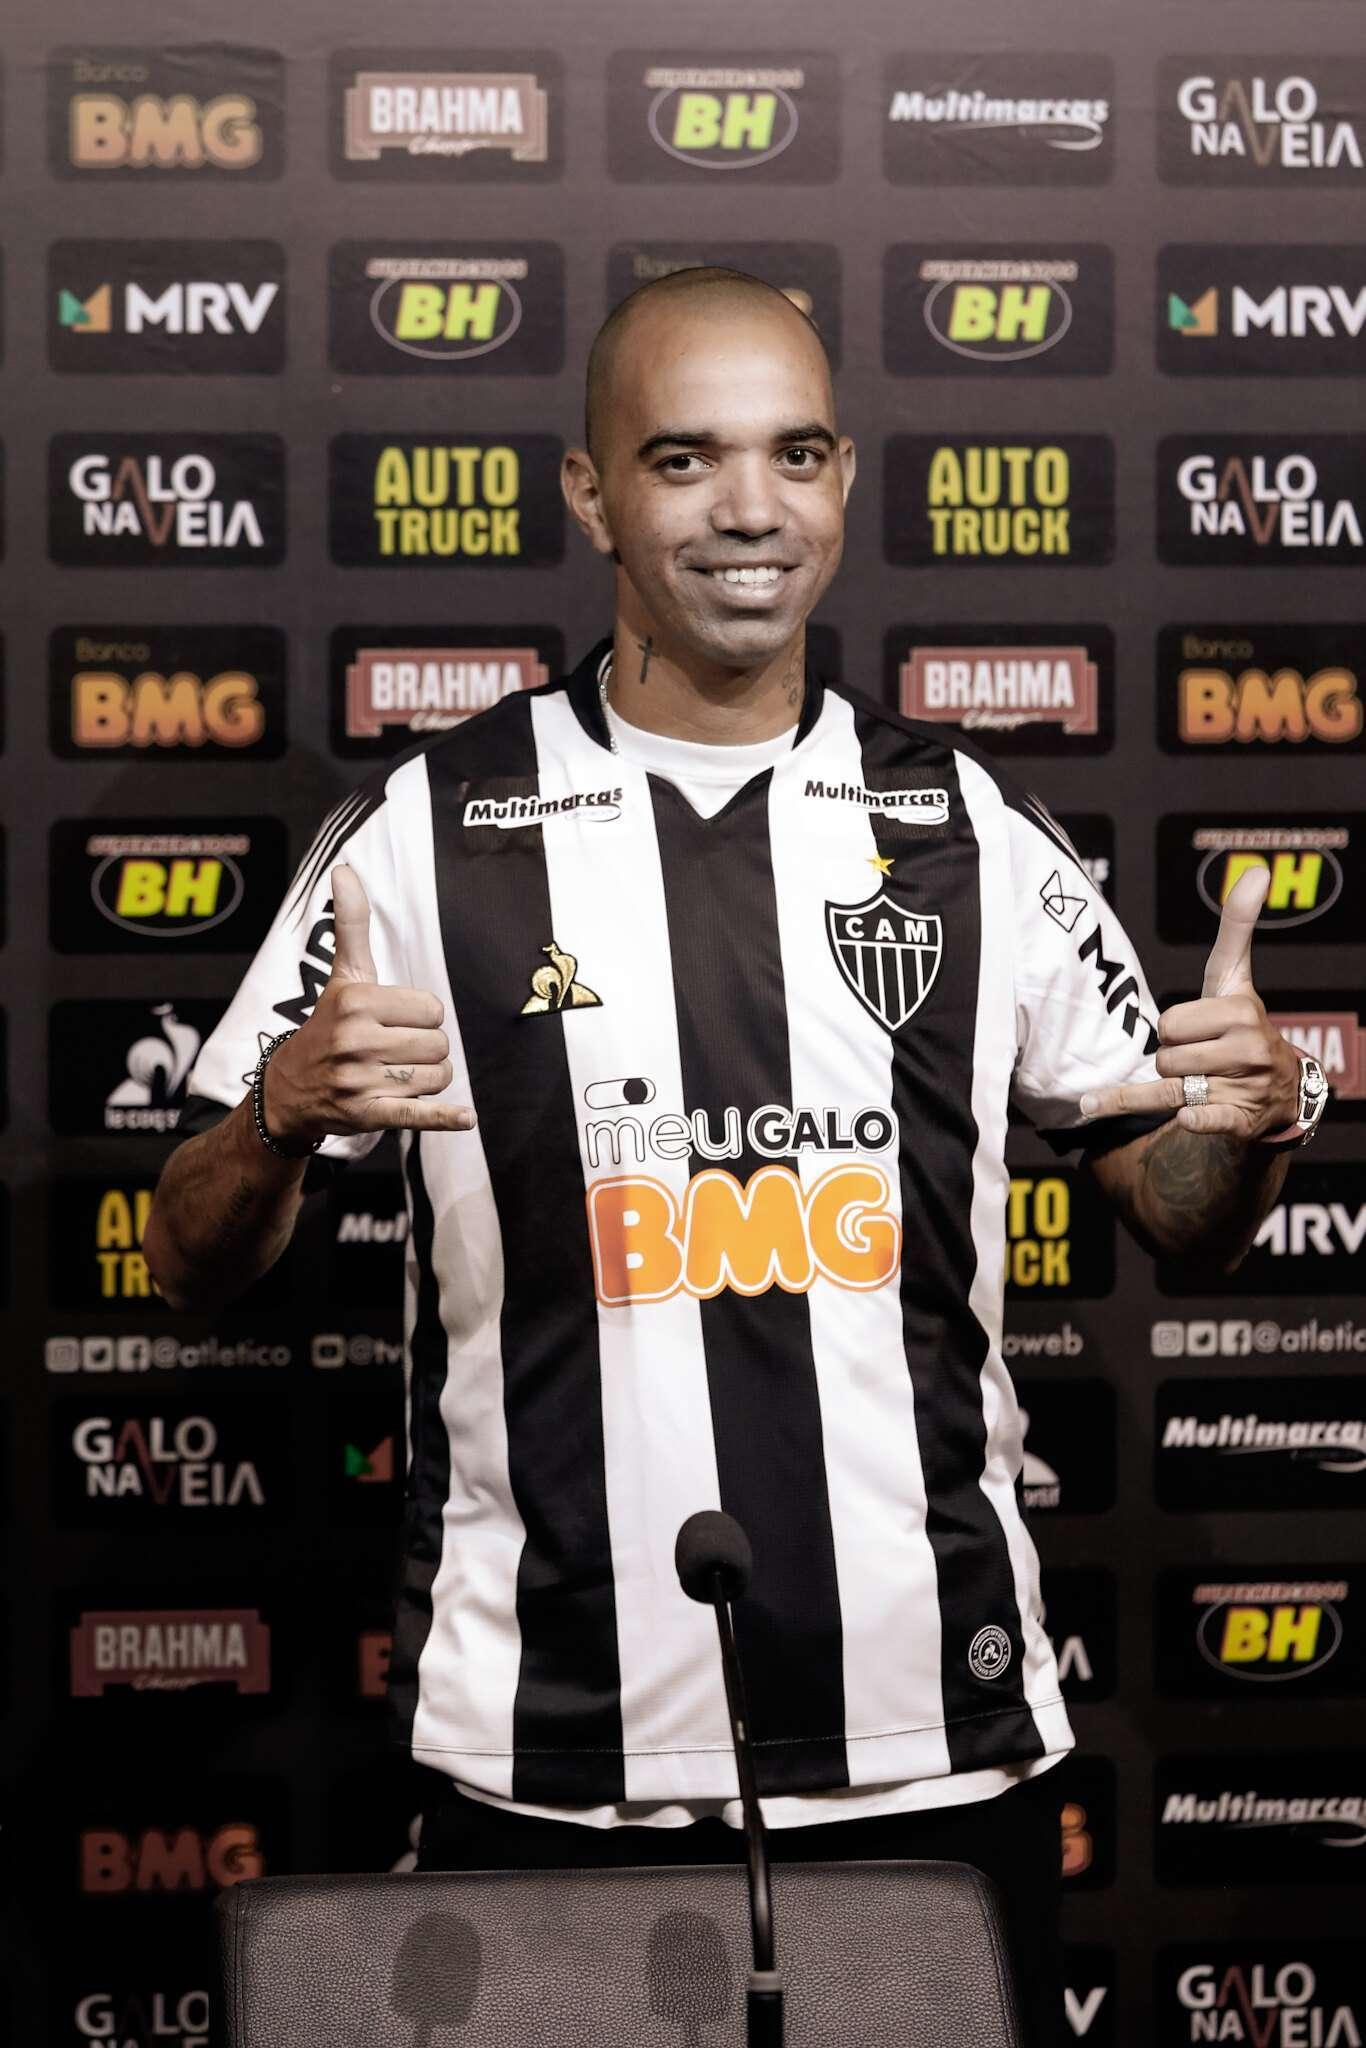 Foto: https://www.flickr.com/photos/clubeatleticomineiro/49543795416/in/album-72157713134258161/ Flickr Atlético